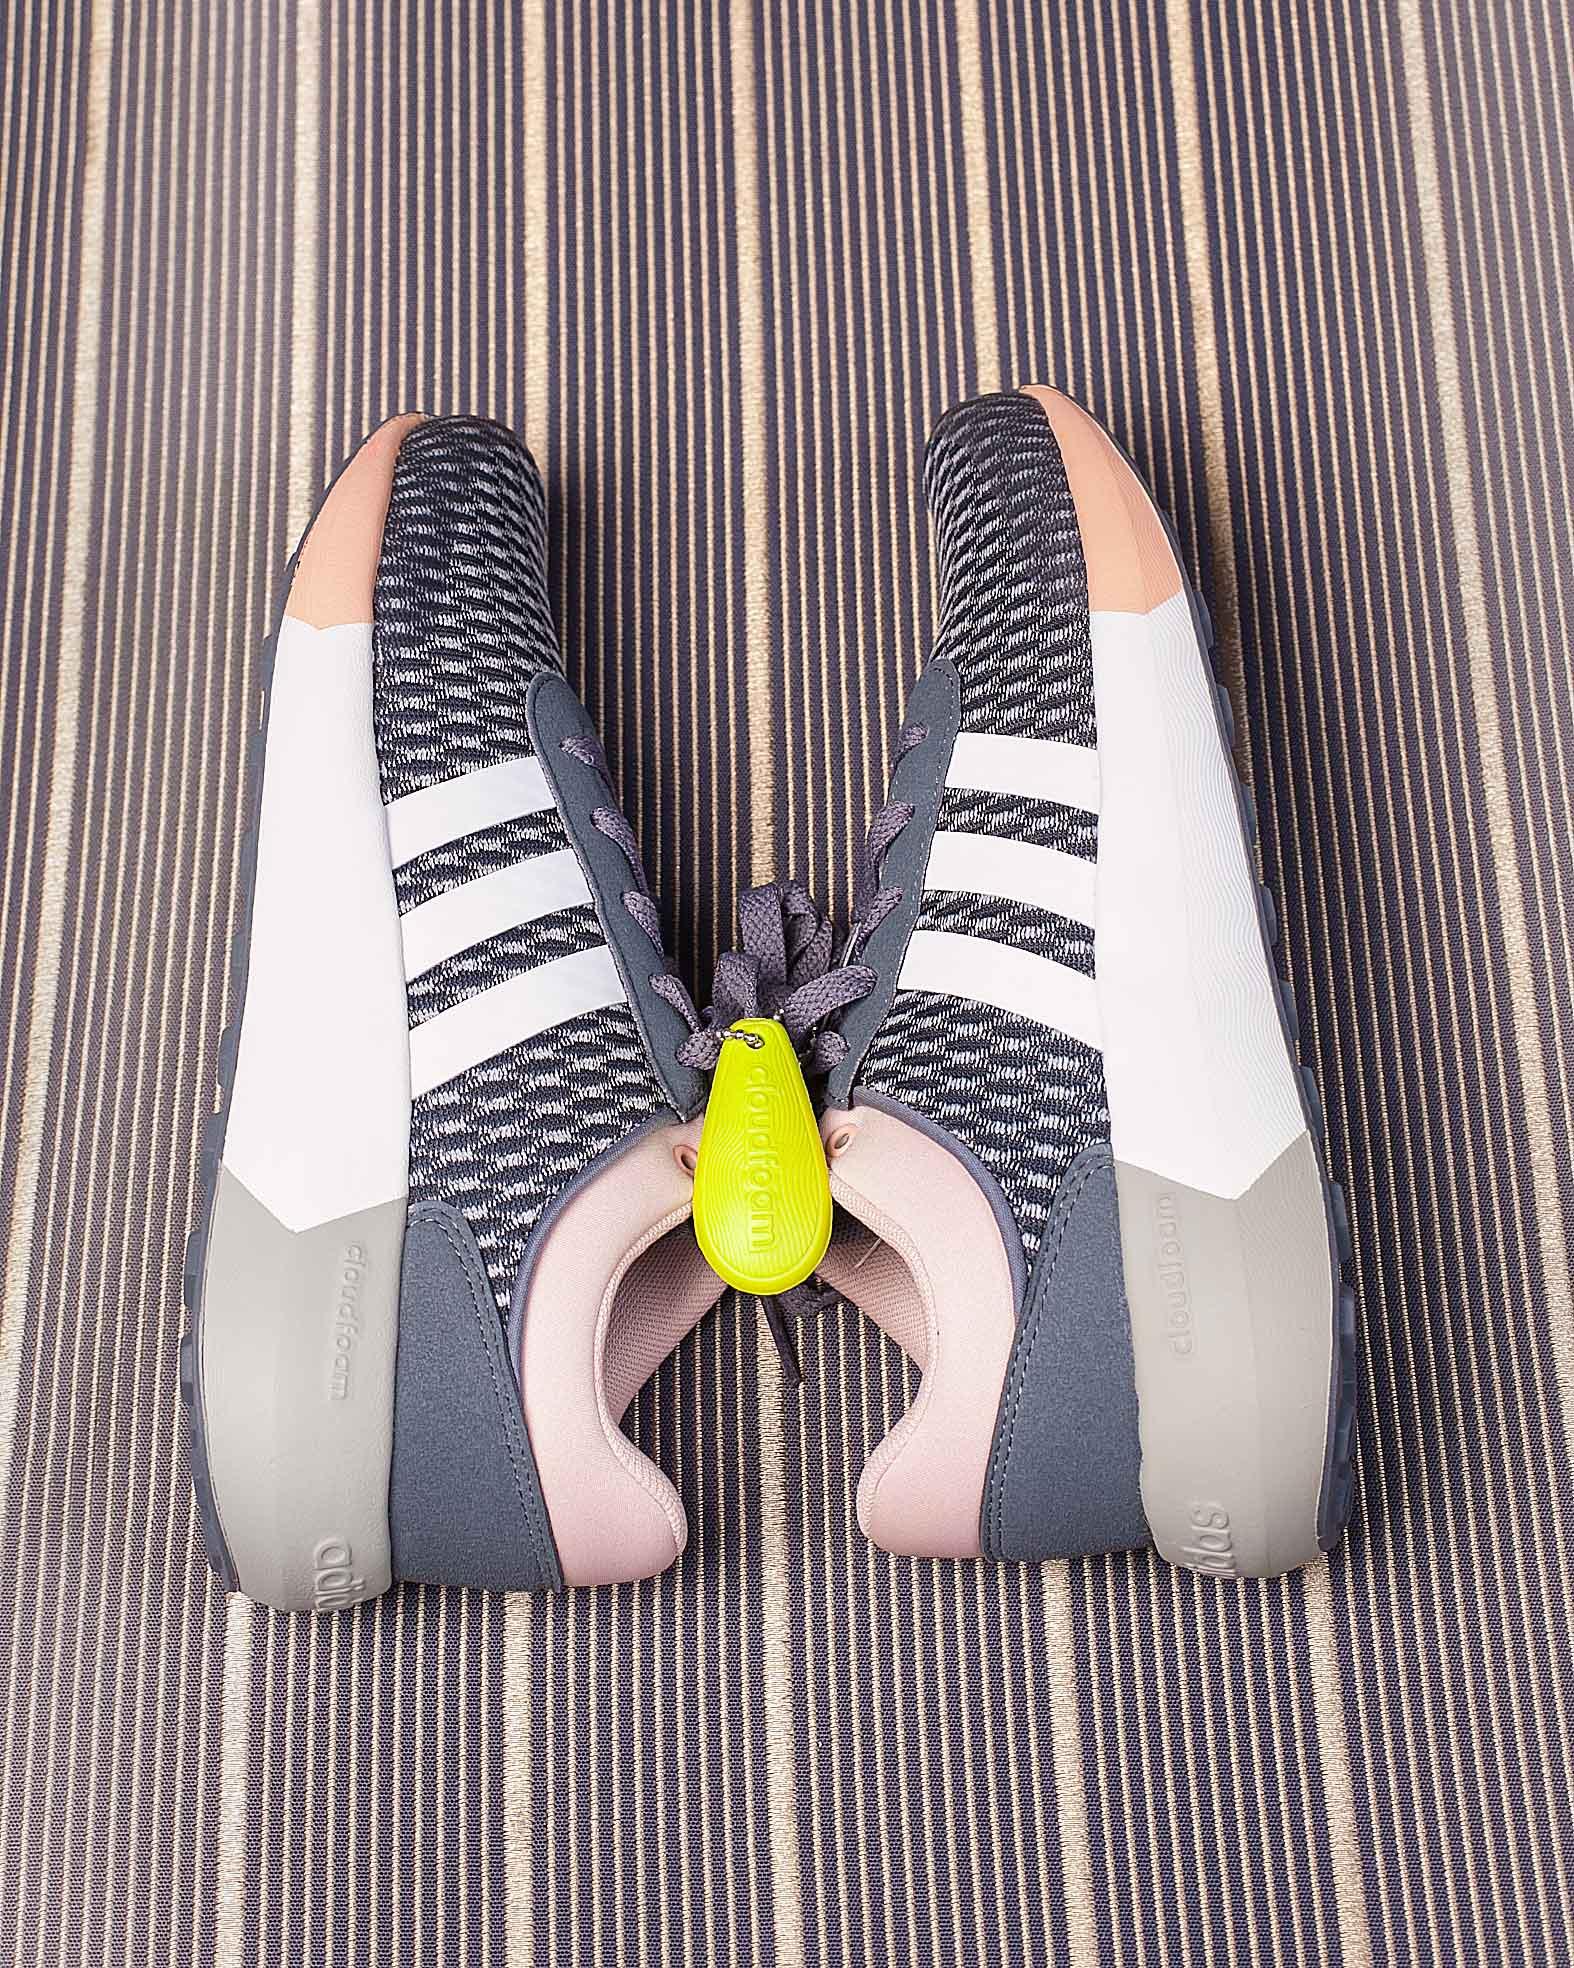 Løpesko med god demping   Adidas Cloudfoam Race Shoes